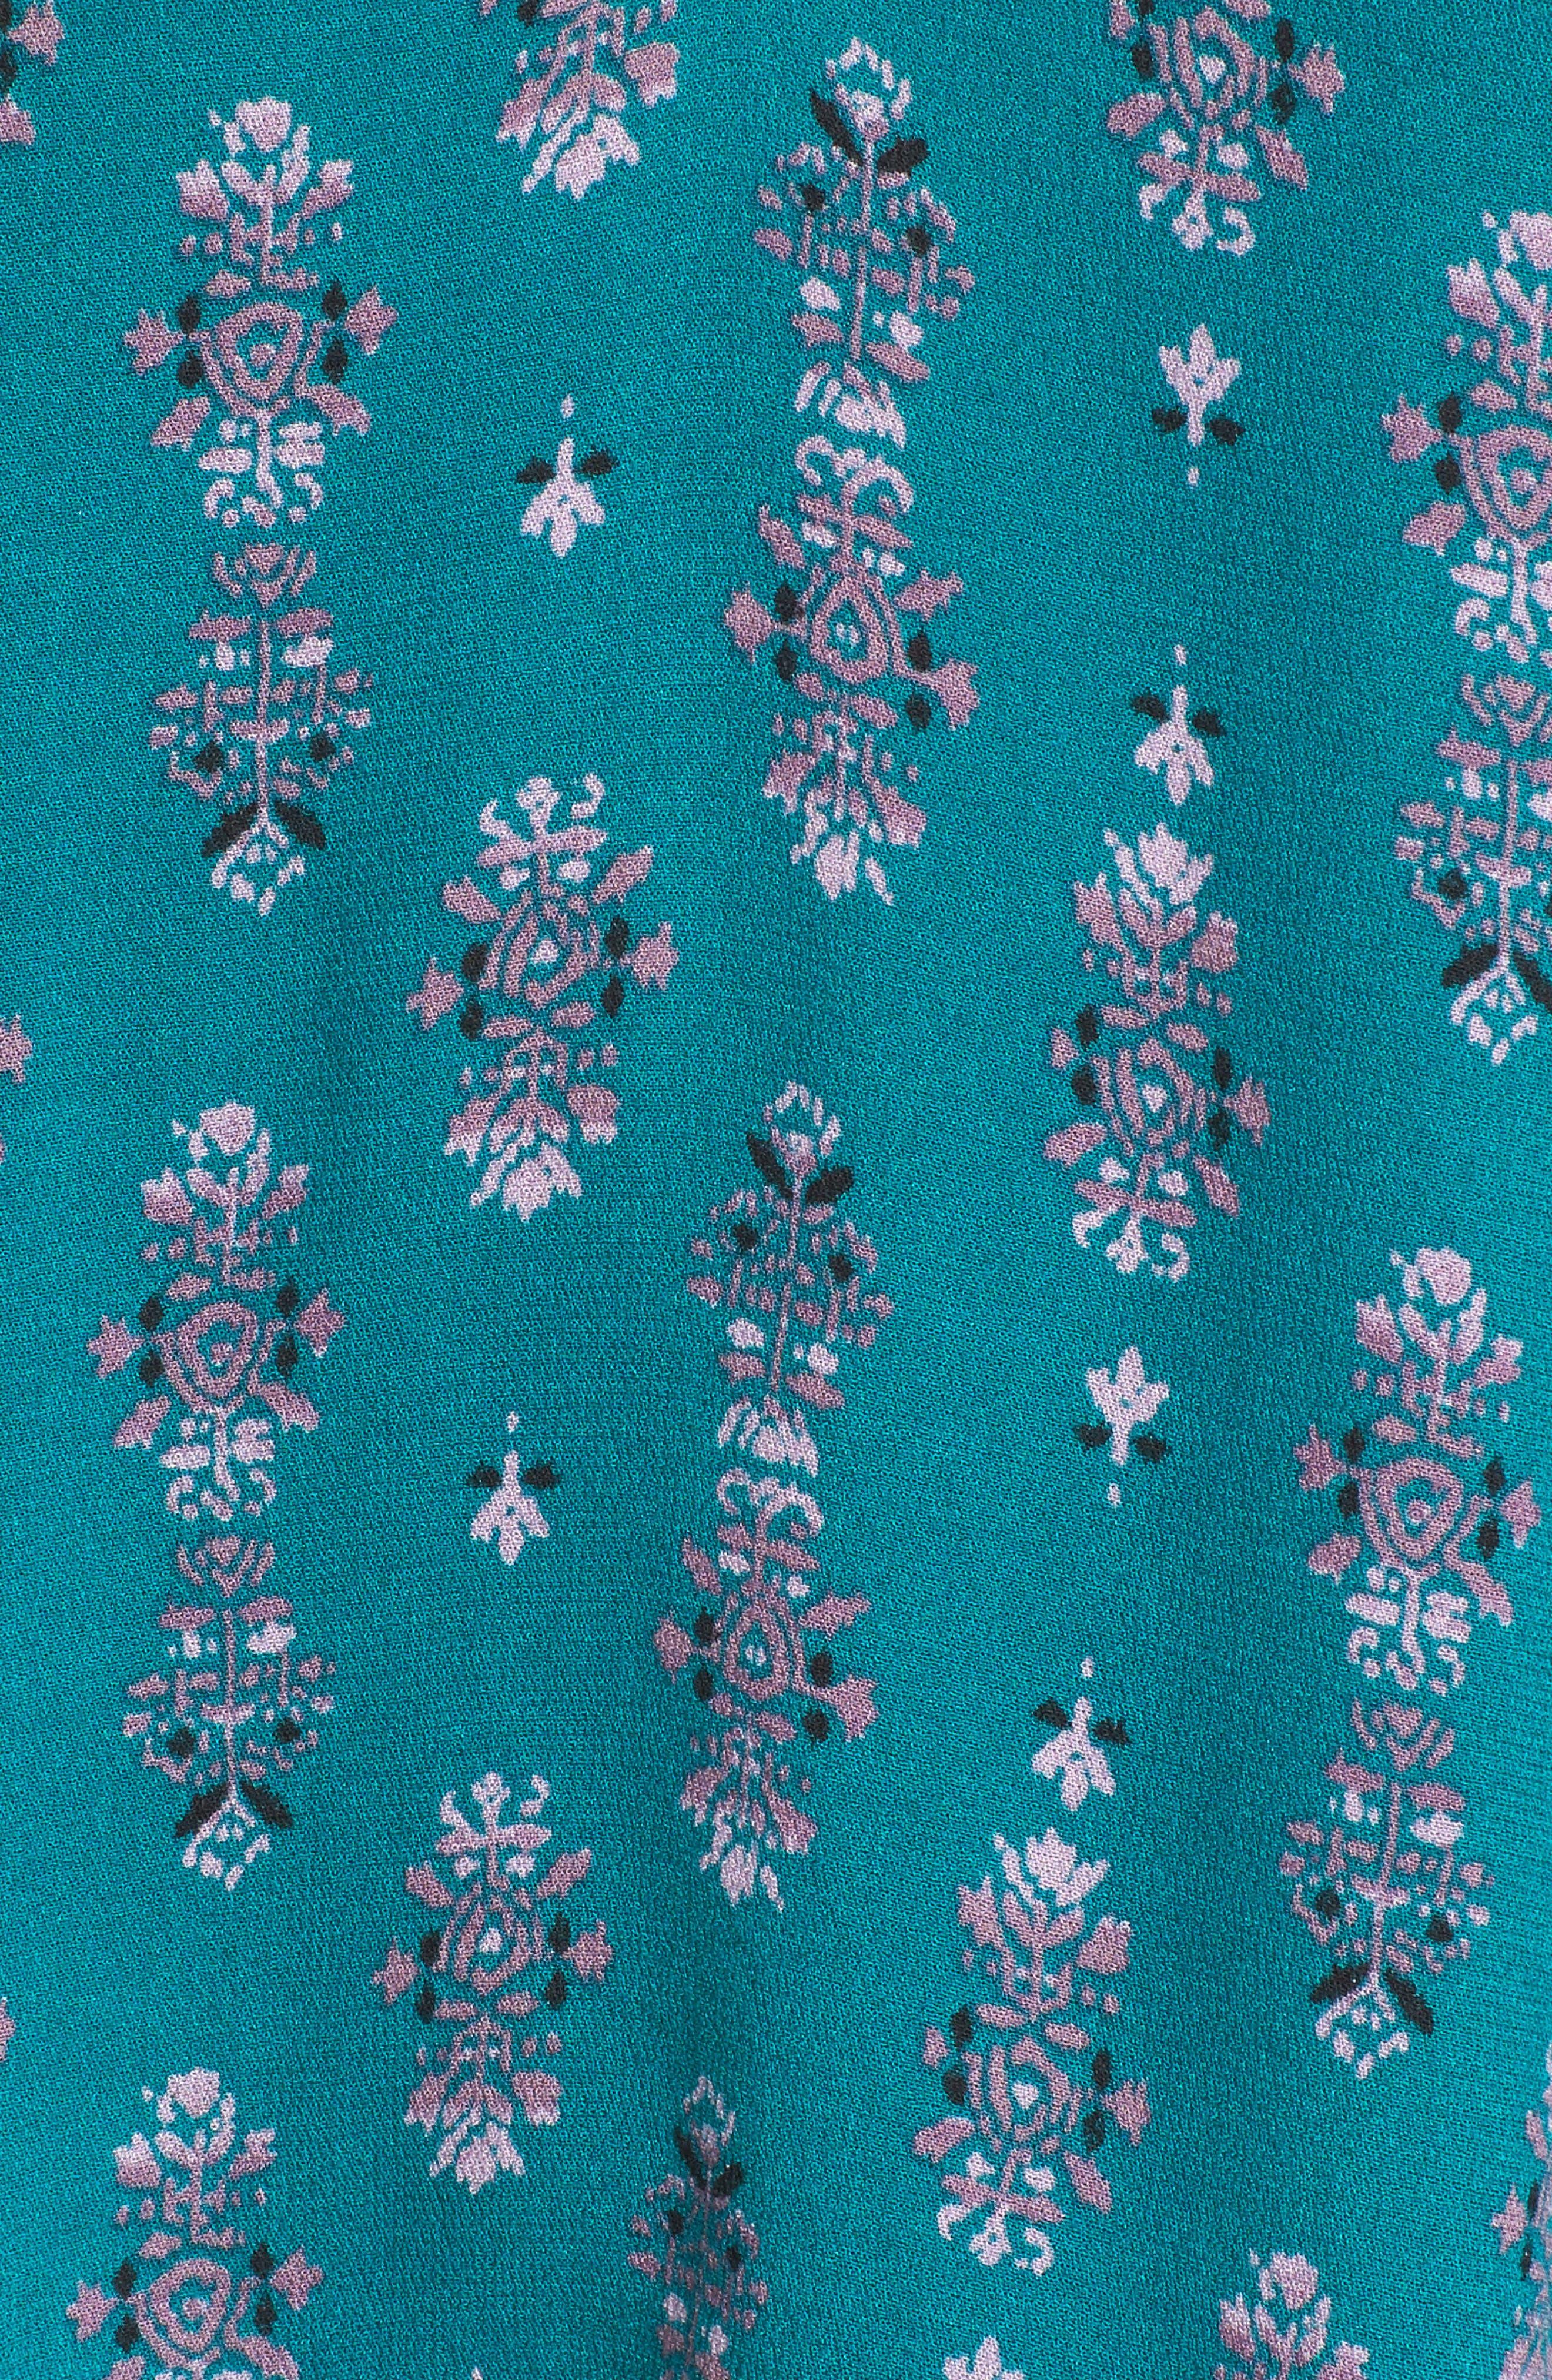 Tie Back Ruffle Trim Top,                             Alternate thumbnail 5, color,                             449